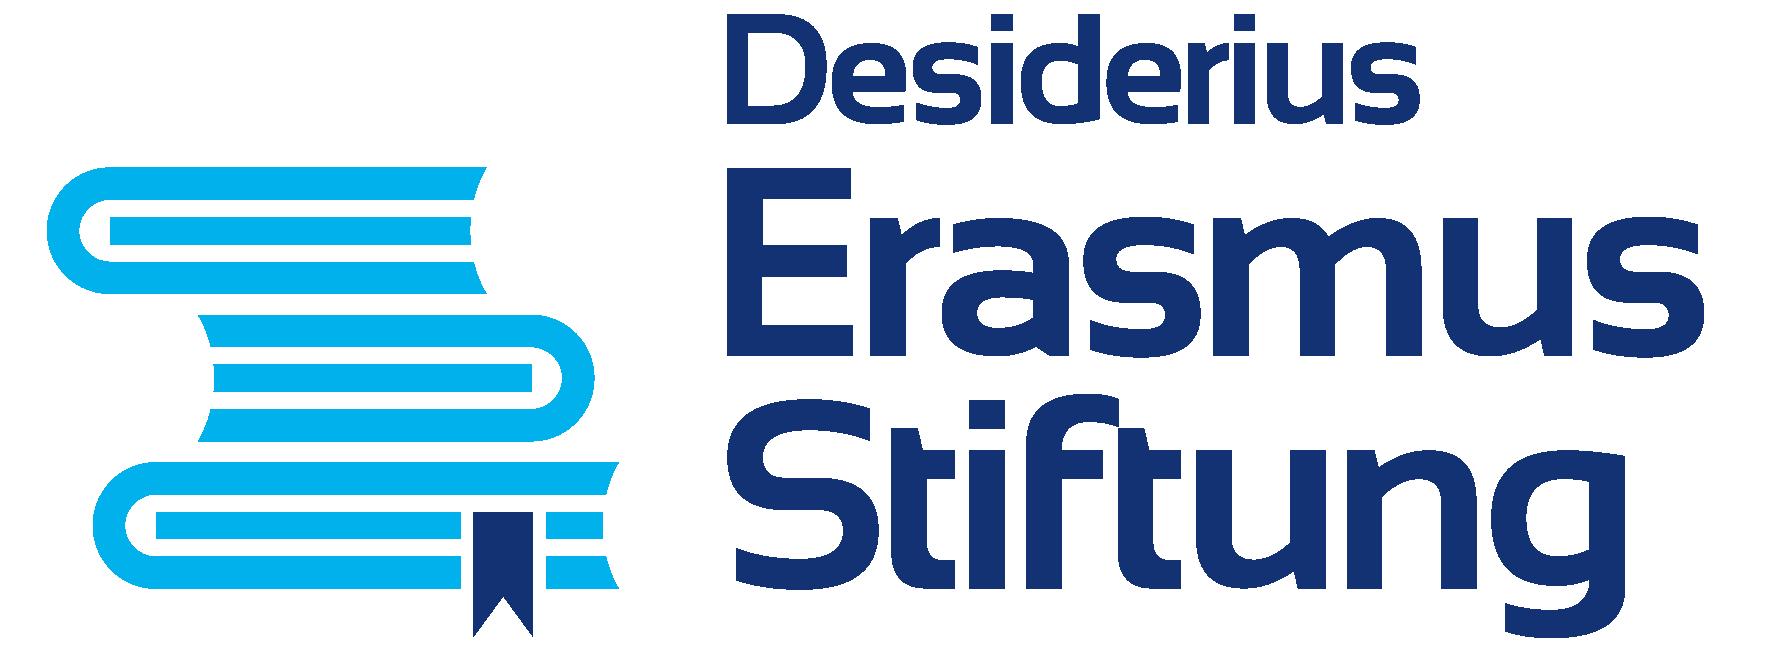 Desiderius-Erasmus-Stiftung e.V.